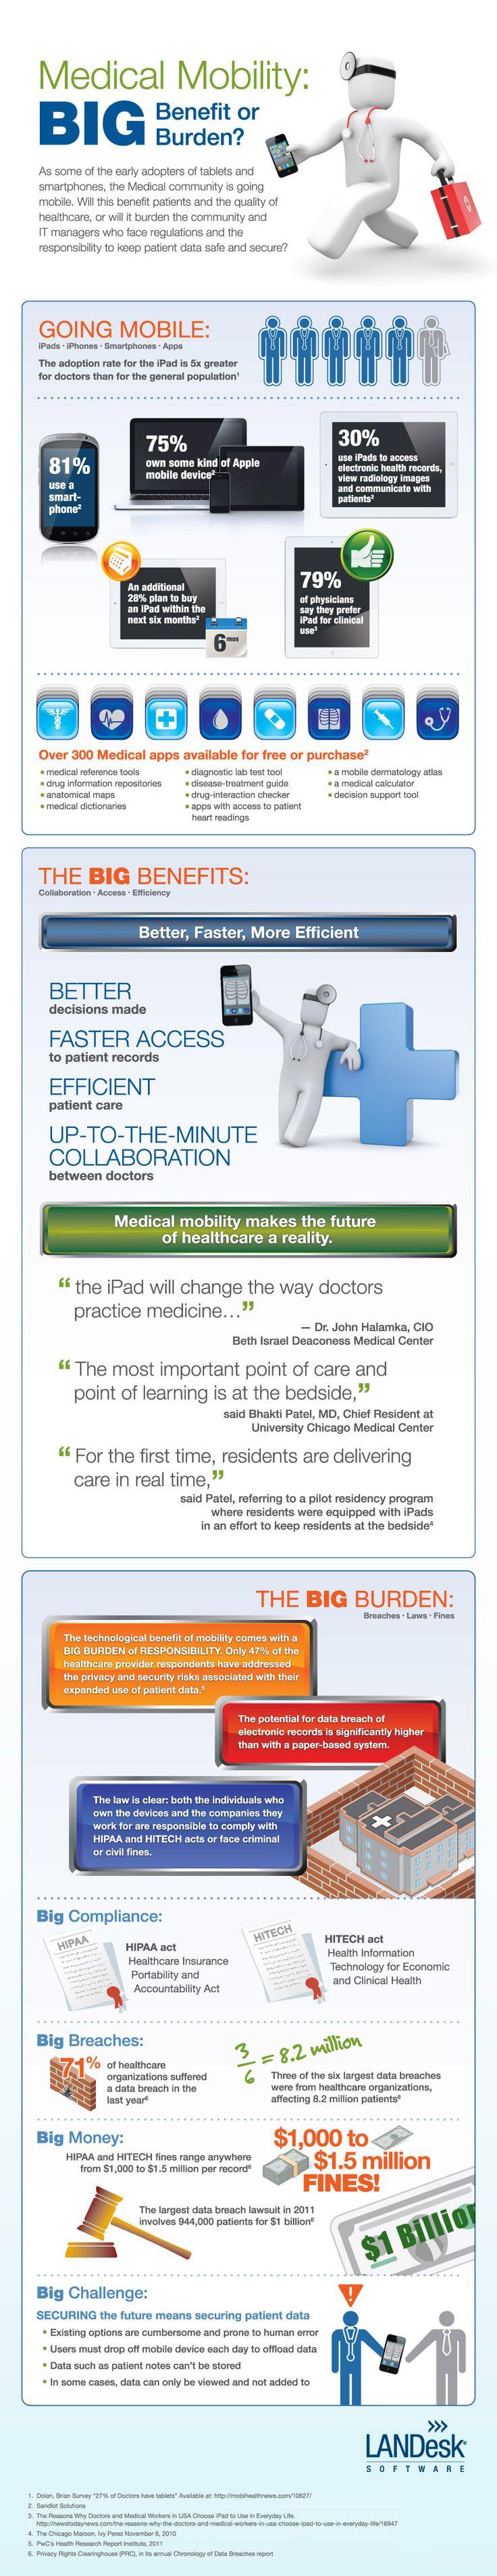 LANDesk Medical Mobility (Infographic)